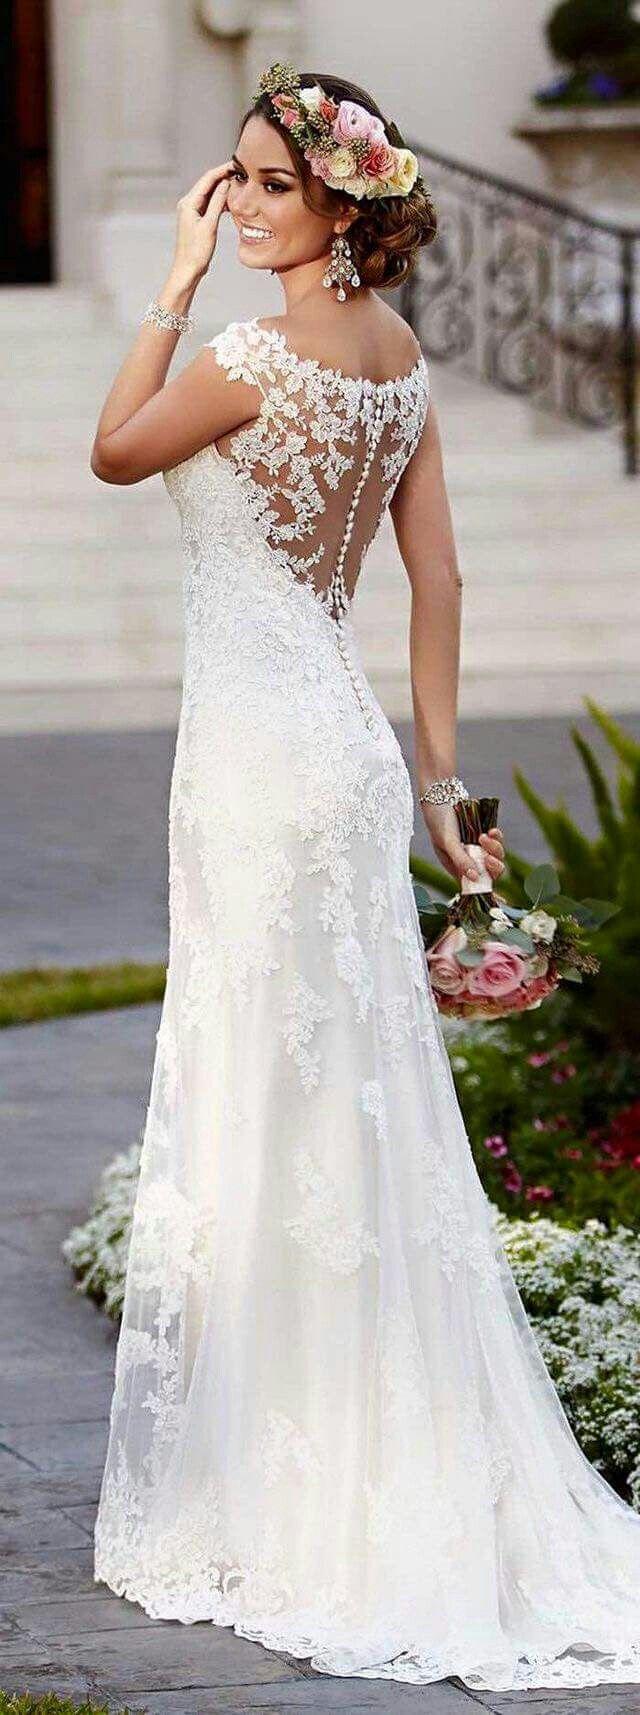 Wedding-Dresses-1041